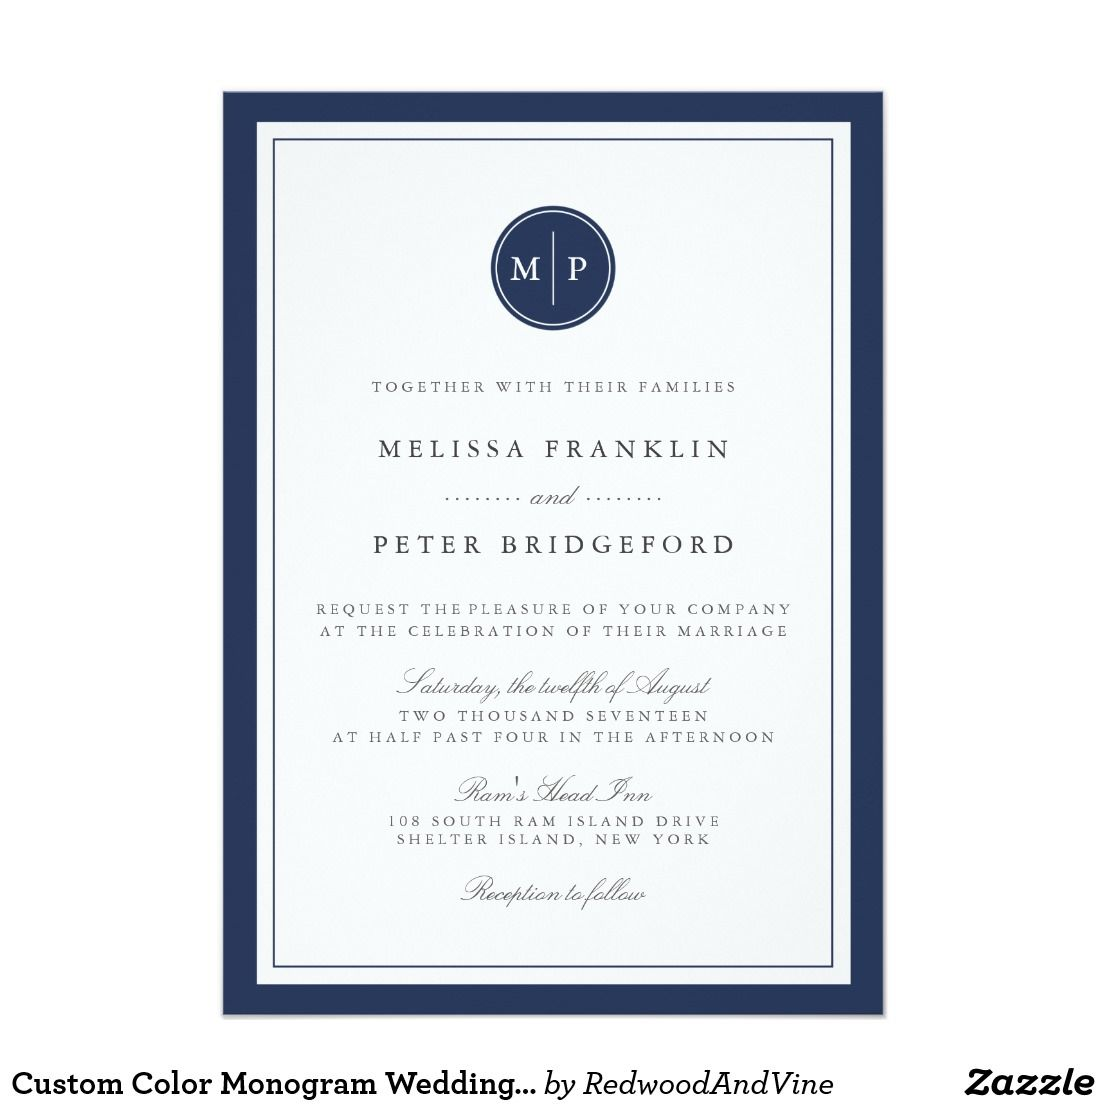 Custom Color Monogram Wedding Invitation | Bridal and Wedding ...